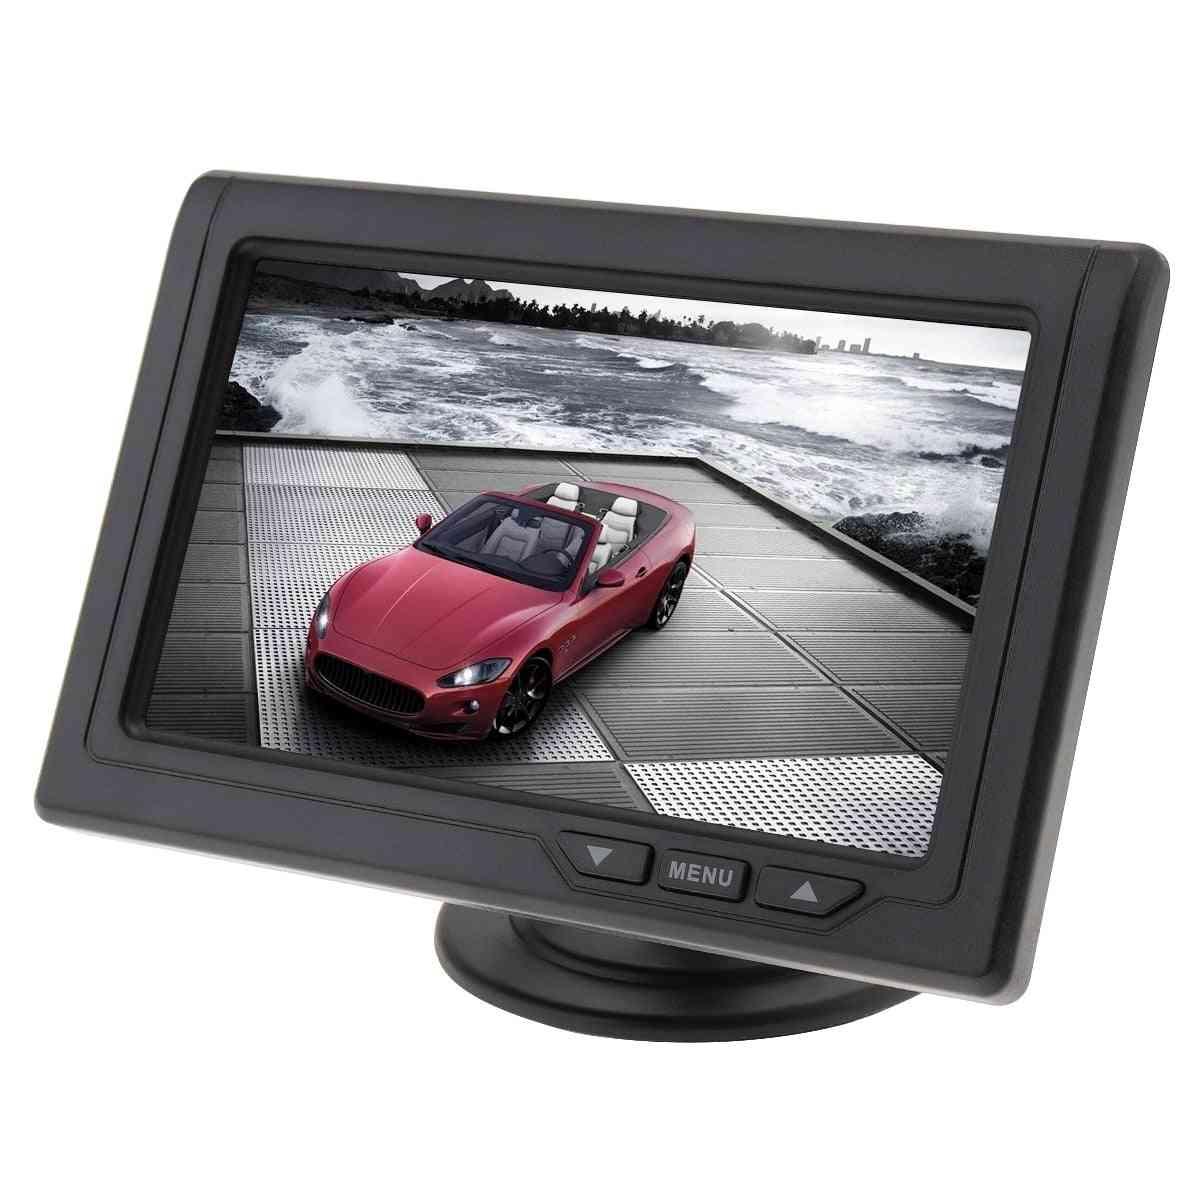 4.3 Inch Car Monitor Car Rear View Parking Backup 480 X 272 Color Tft Lcd Screen